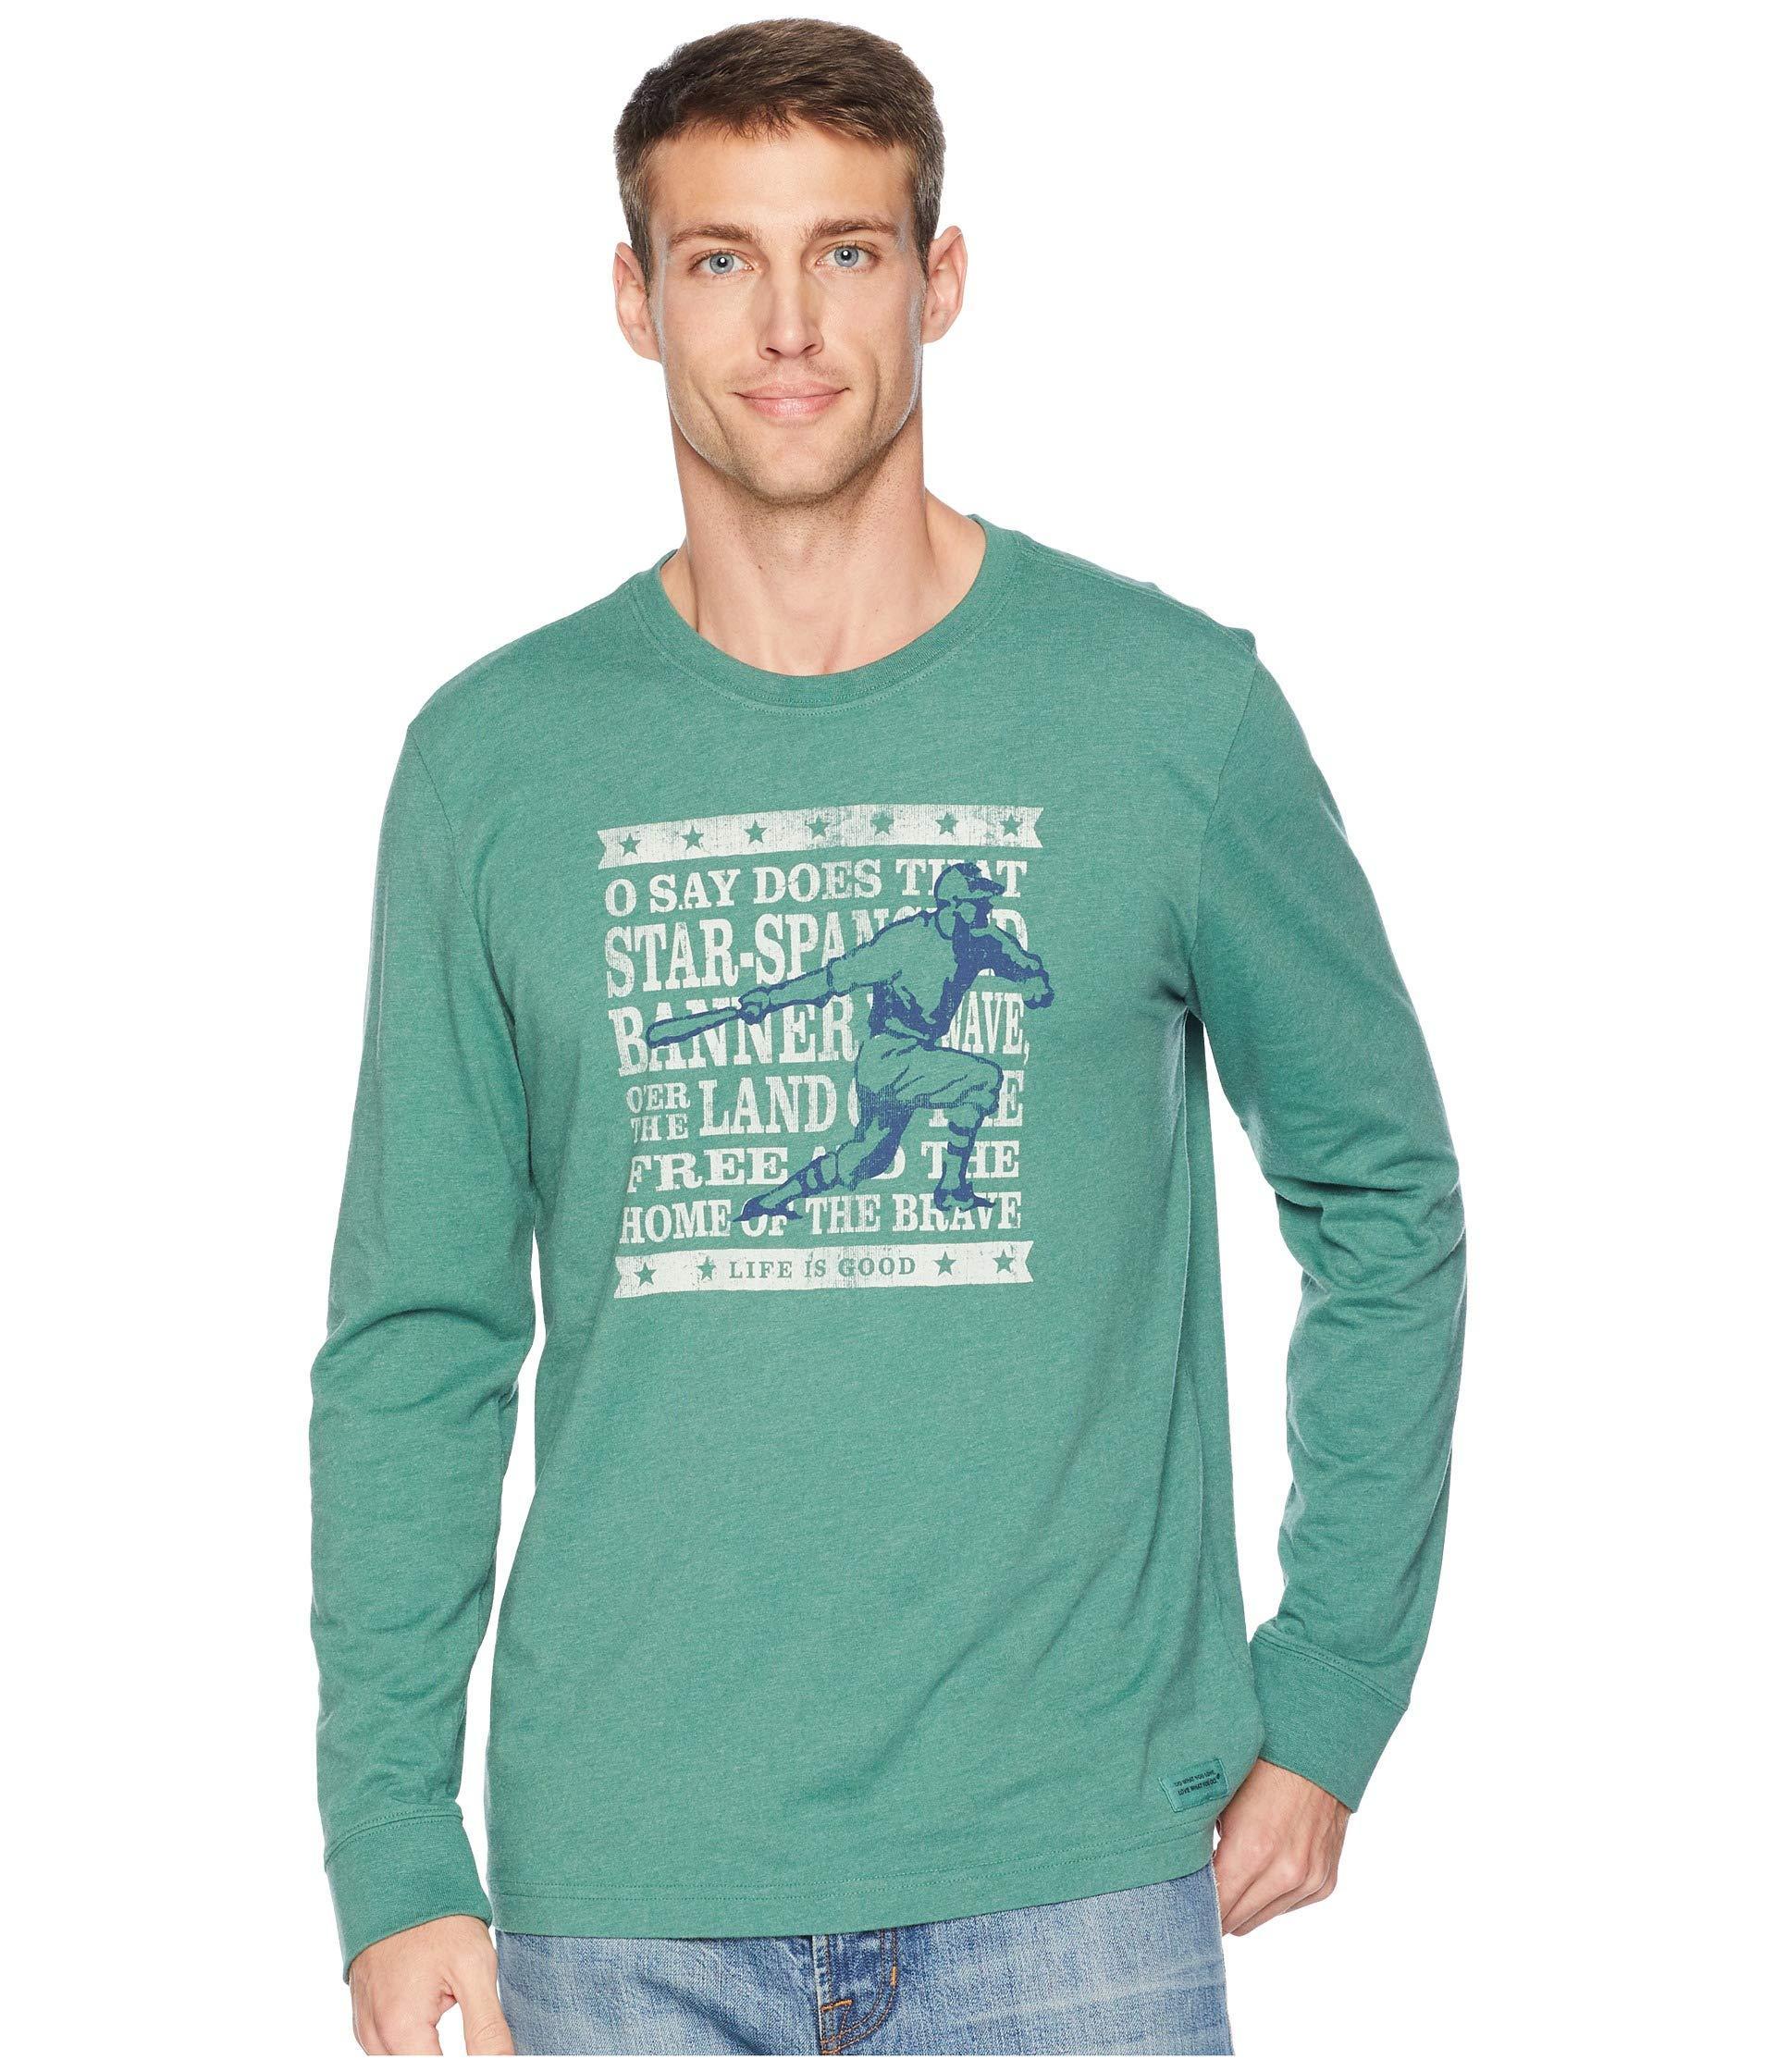 75e7fccc4c1 Lyst - Life Is Good. Brave Baseball Crusher Long Sleeve T-shirt in ...